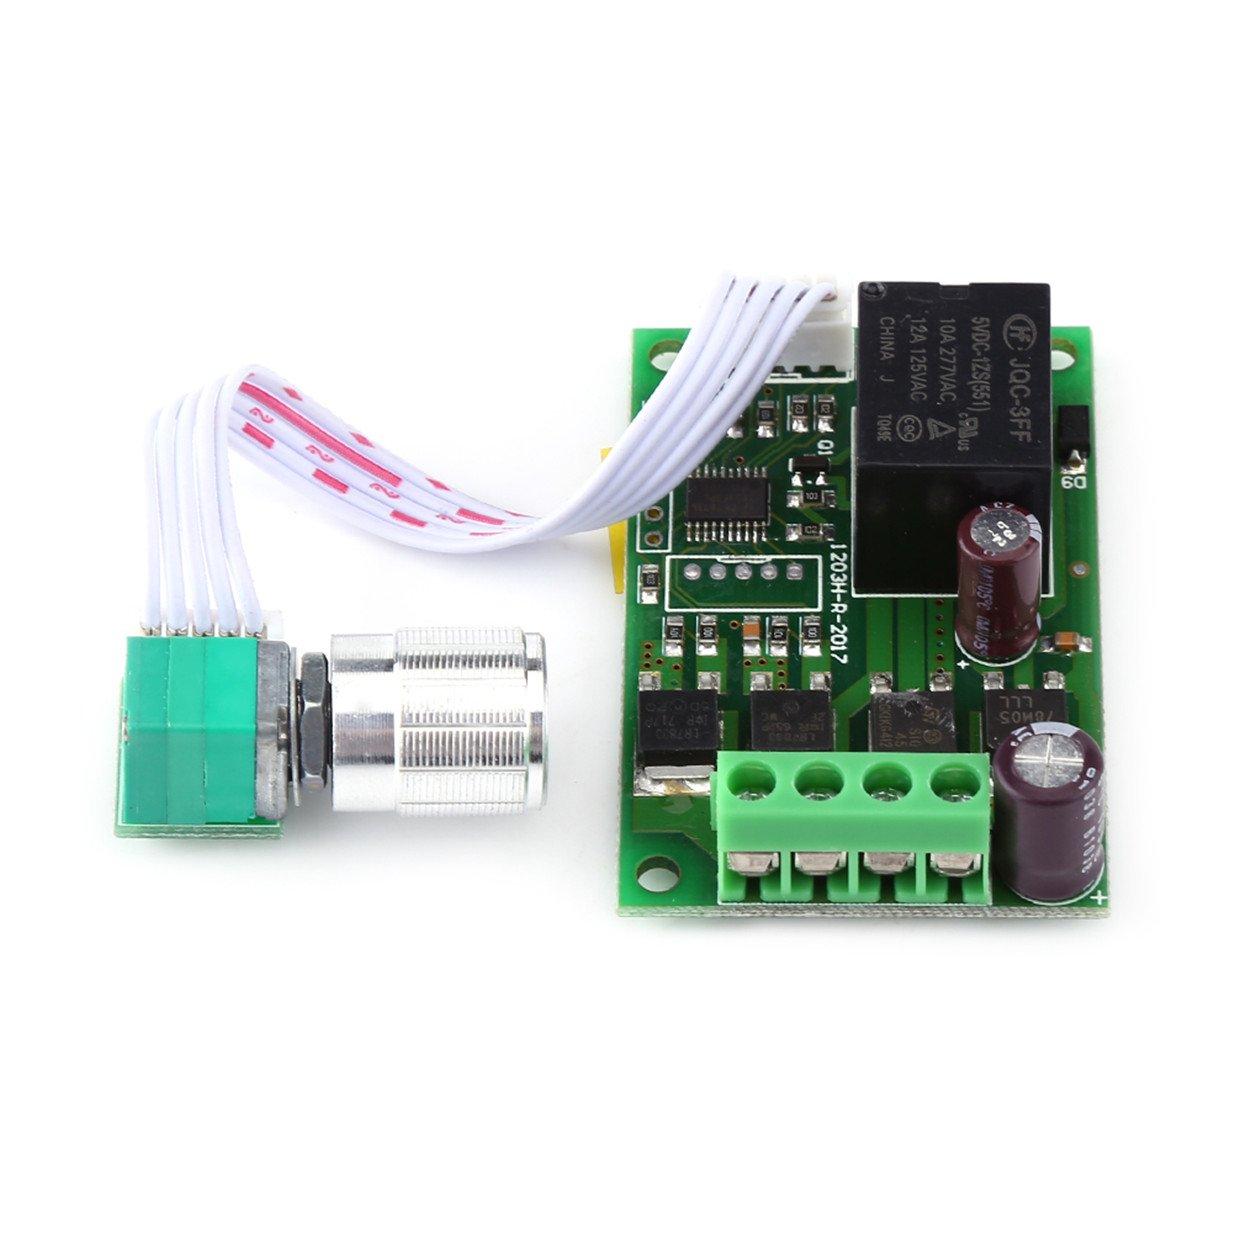 PWM 12V/24V 3A DC Motor Controller Automatic Reversible Motor Speed Adjustable Electric Regulator